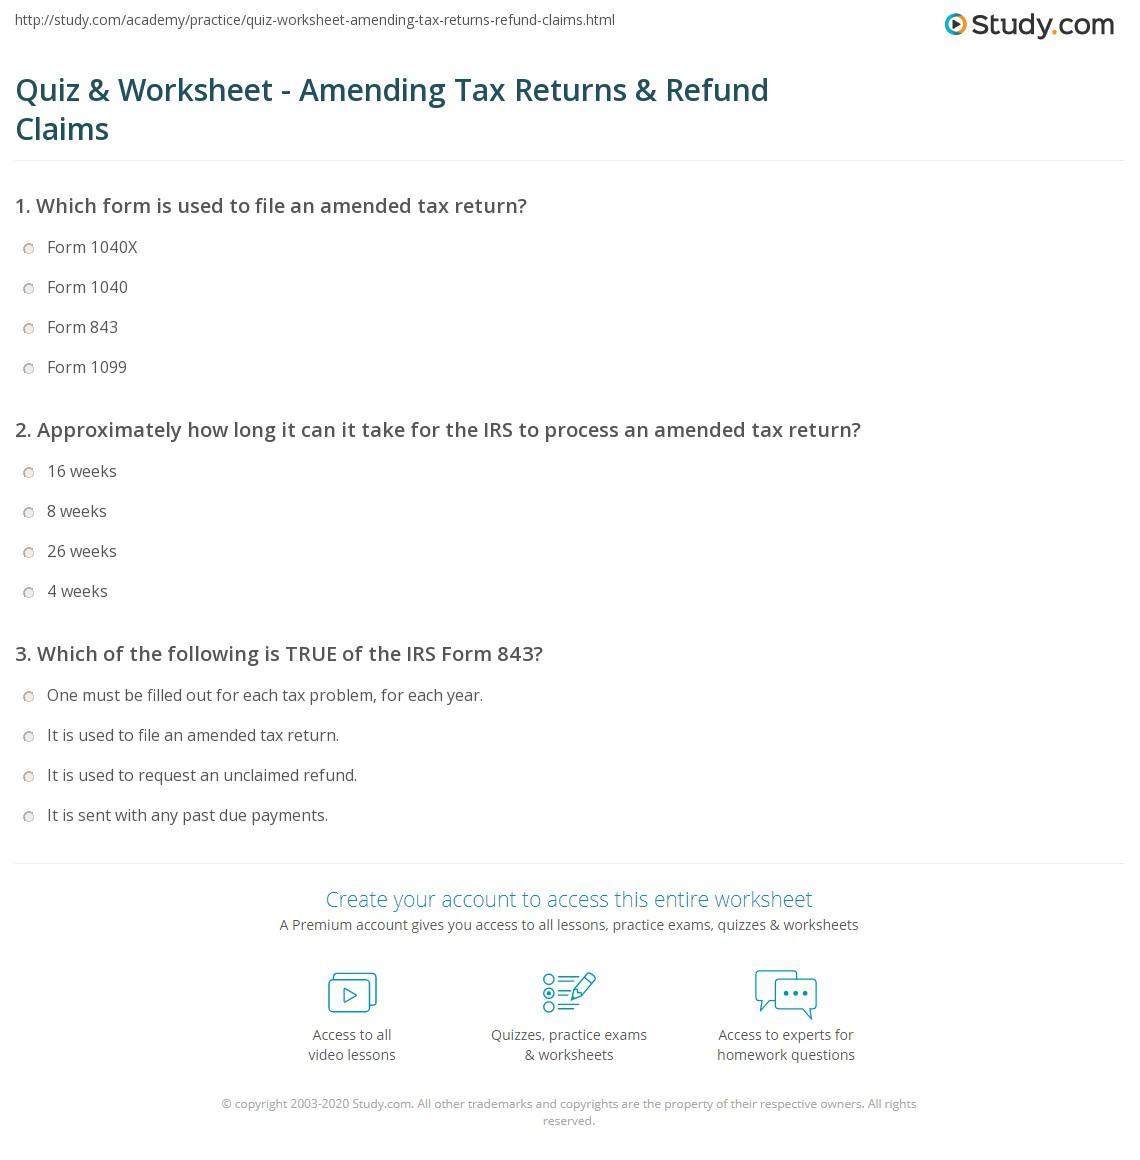 Quiz & Worksheet - Amending Tax Returns & Refund Claims | Study.com